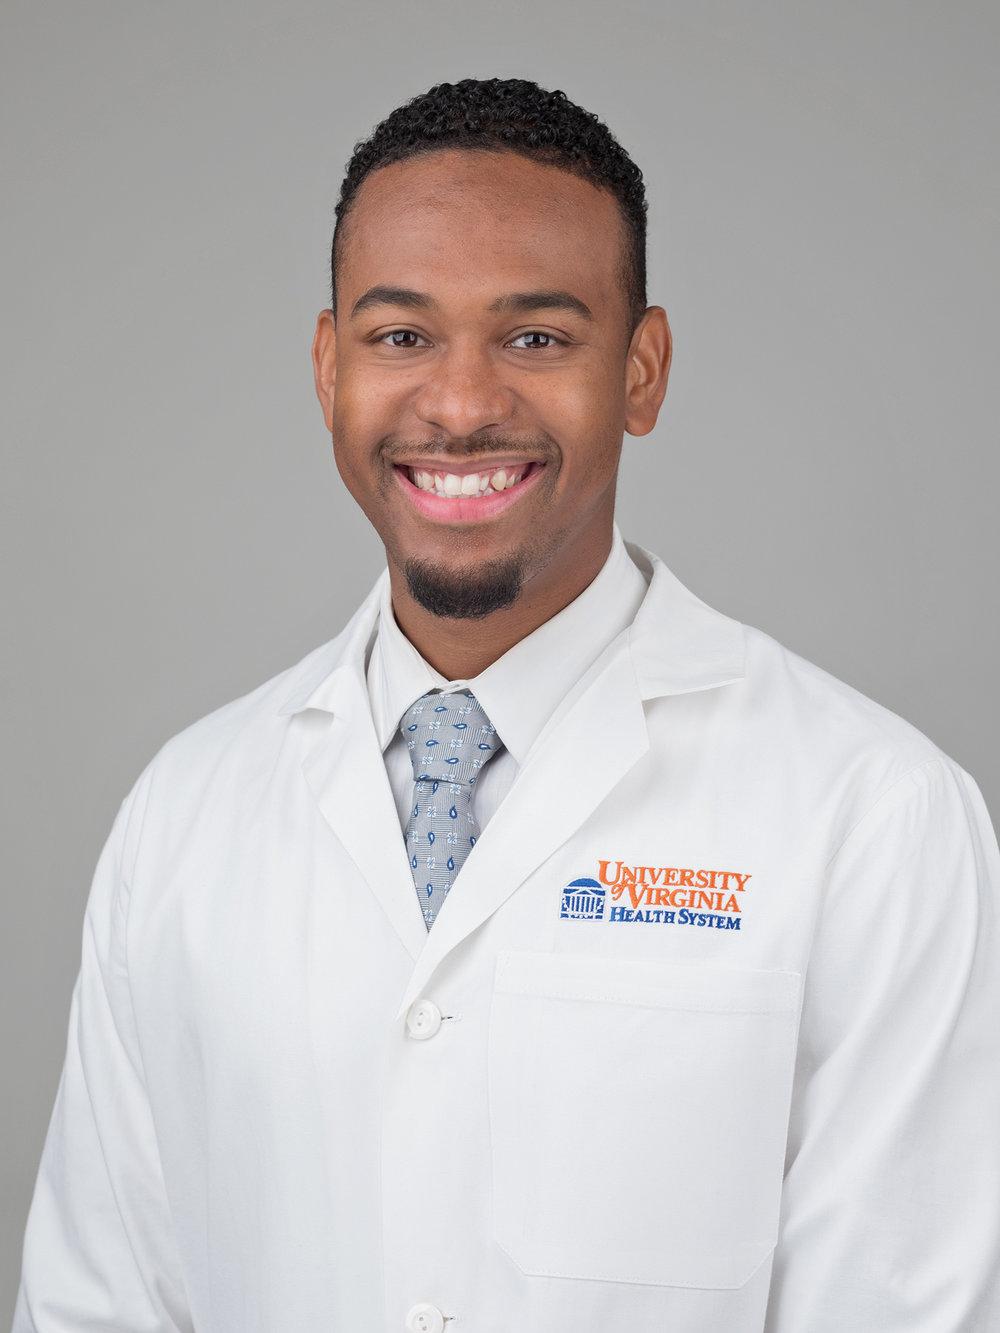 B. Cameron Webb, MD, JD